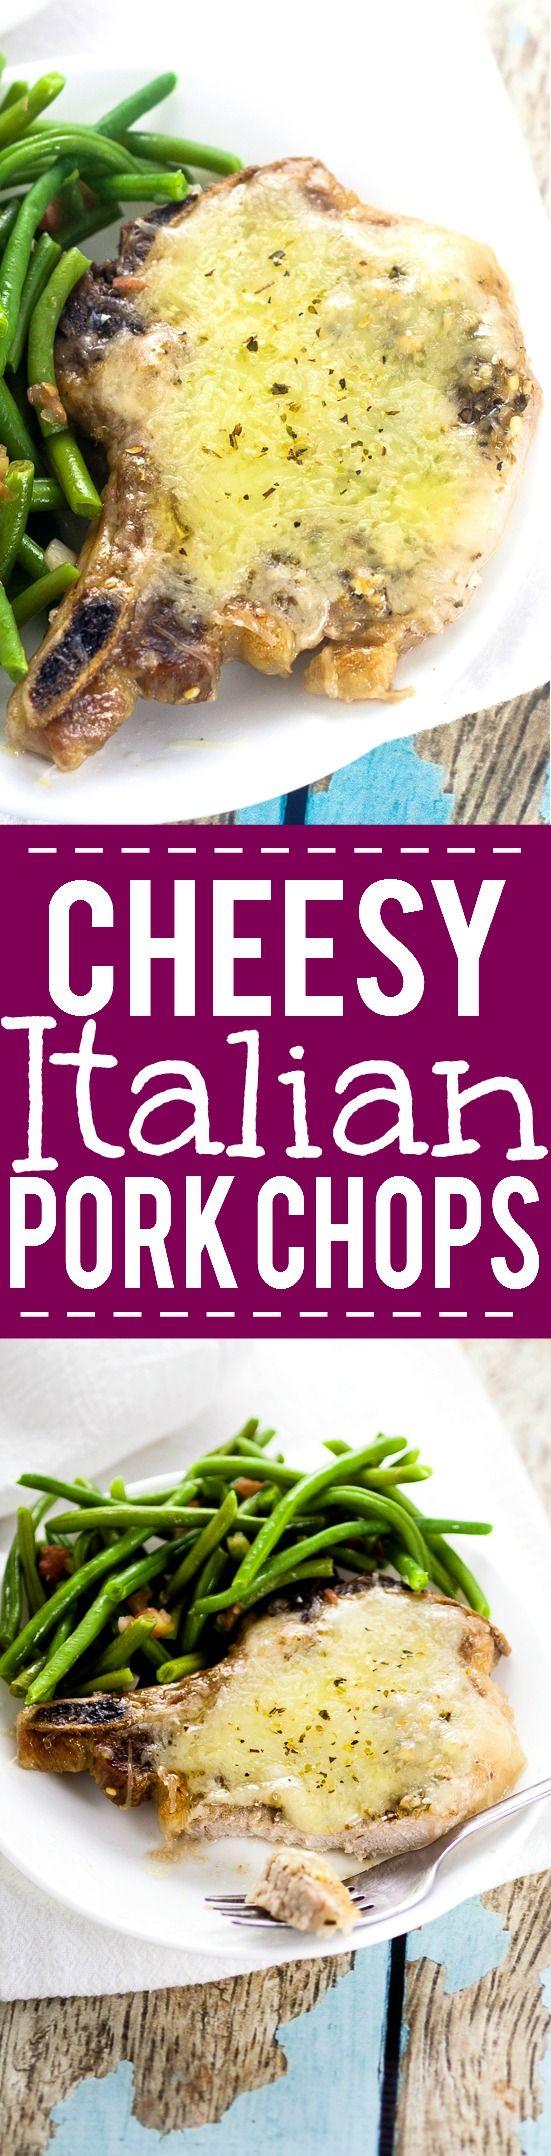 Cheesy Italian Pork Chops Recipe -Juicy, flavorful pork chops, baked in…